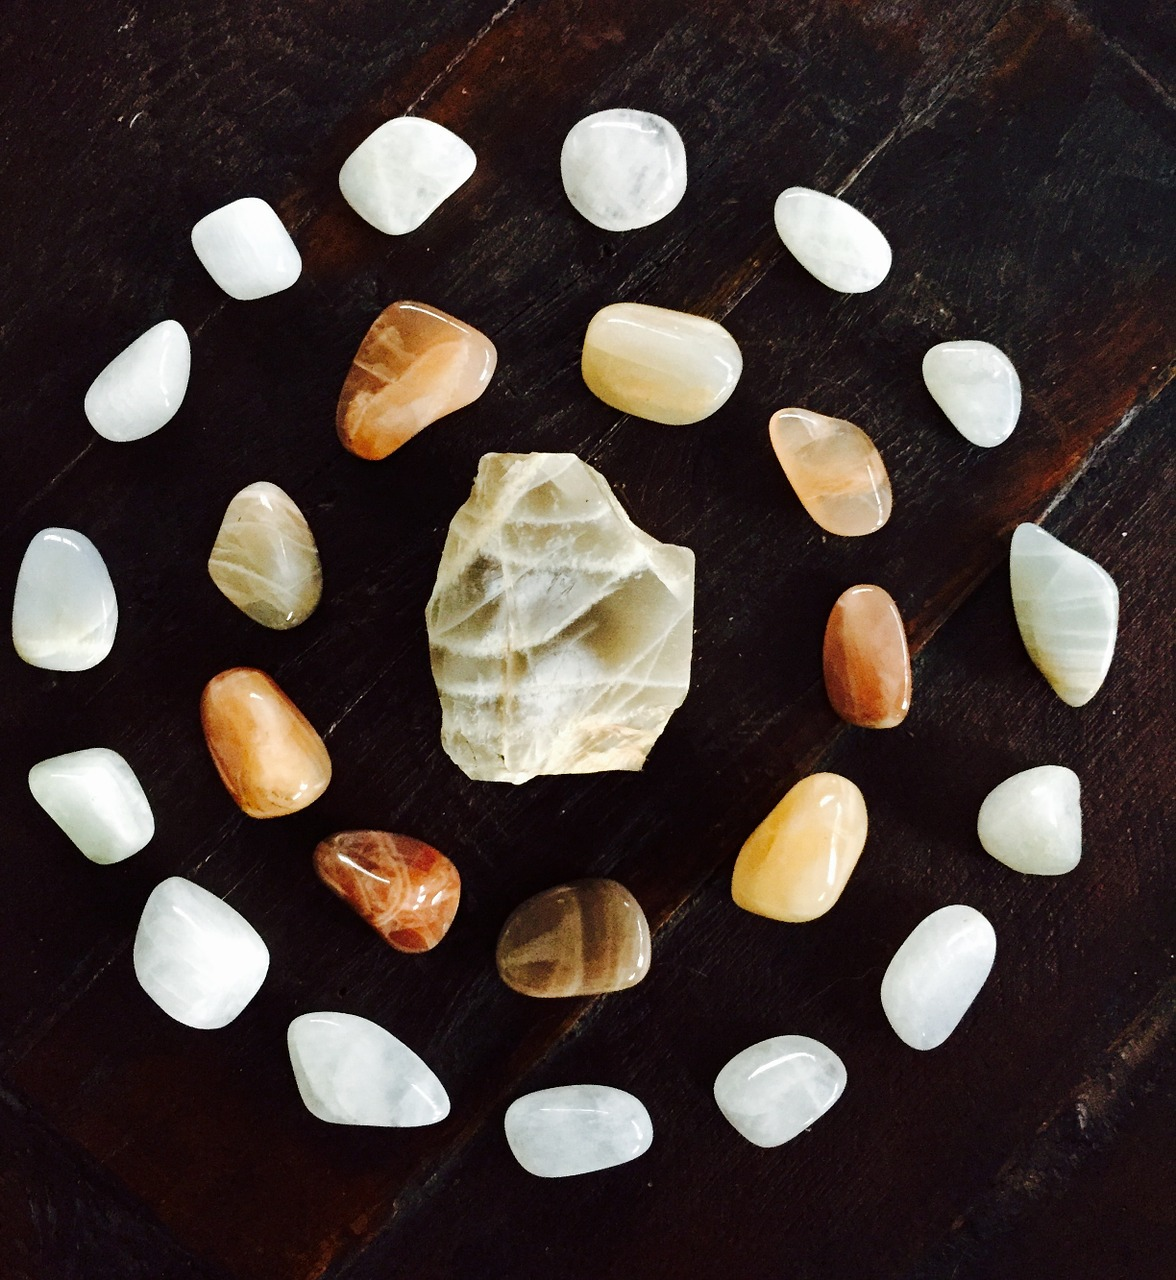 Moonstone-Crystal-healing-Mandala-Cycles-Gemstone-1447240.jpg